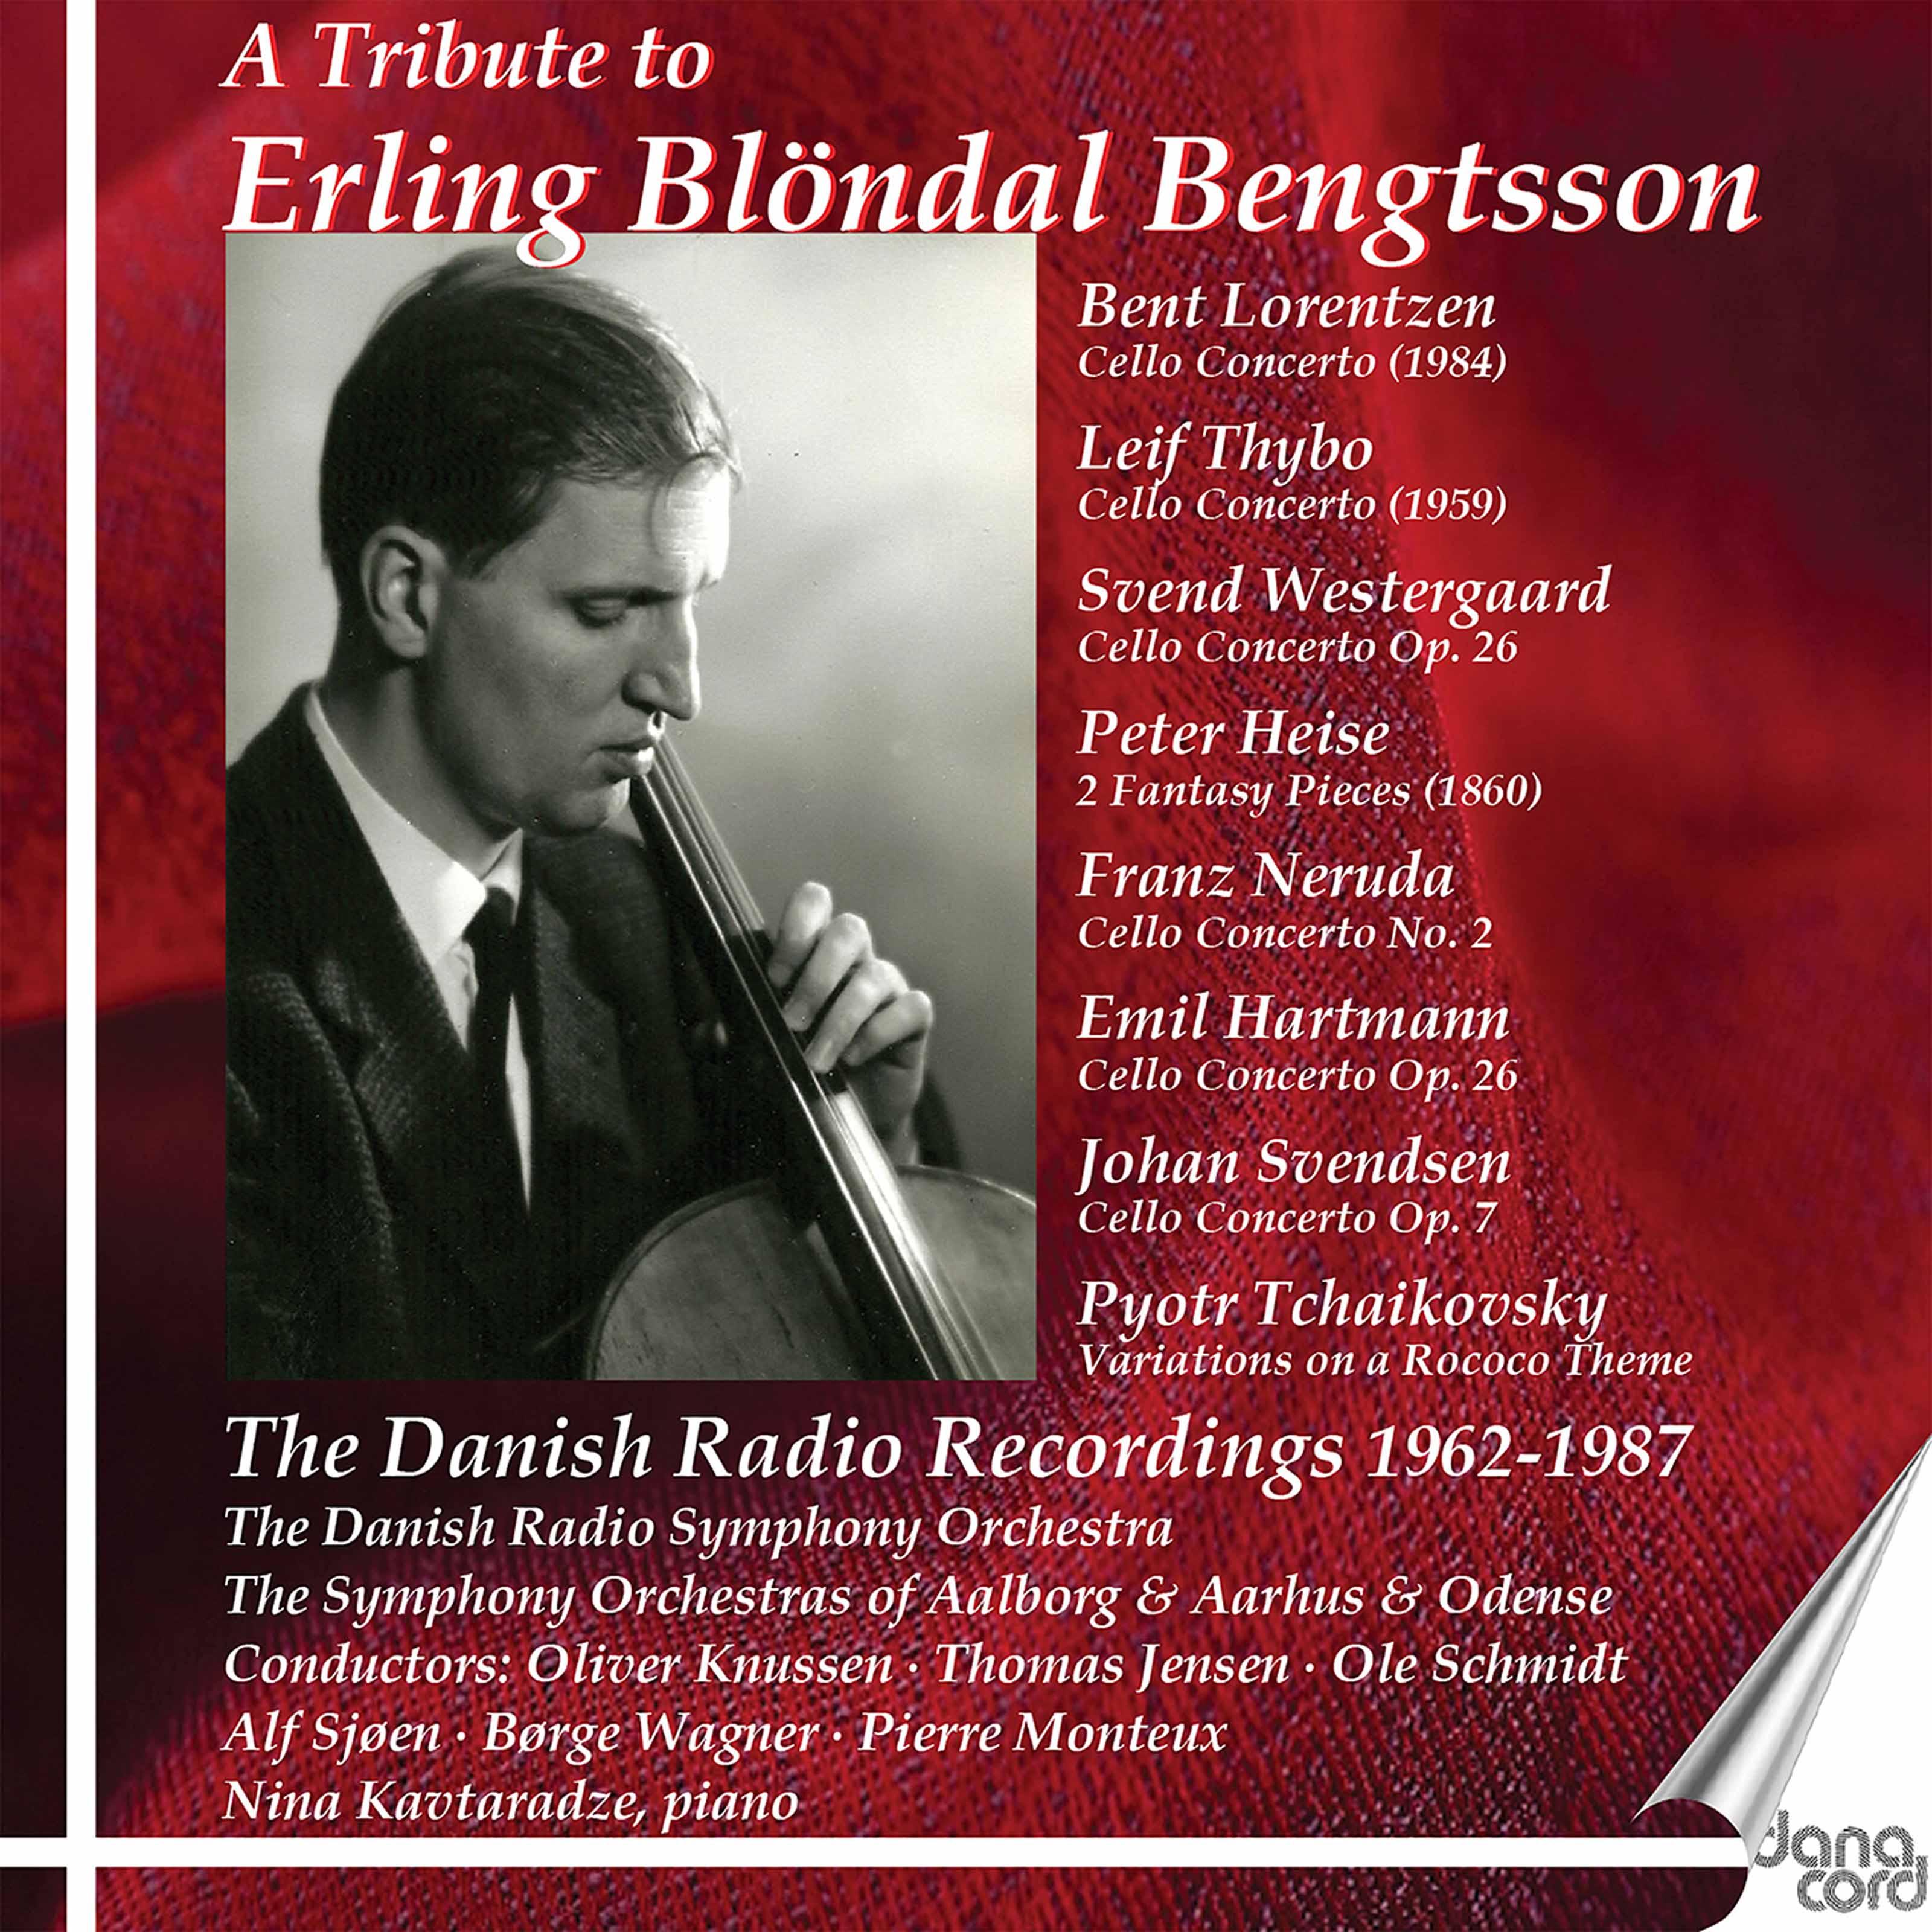 A Tribute to Erling Blöndal Bengtsson, Vol. 2